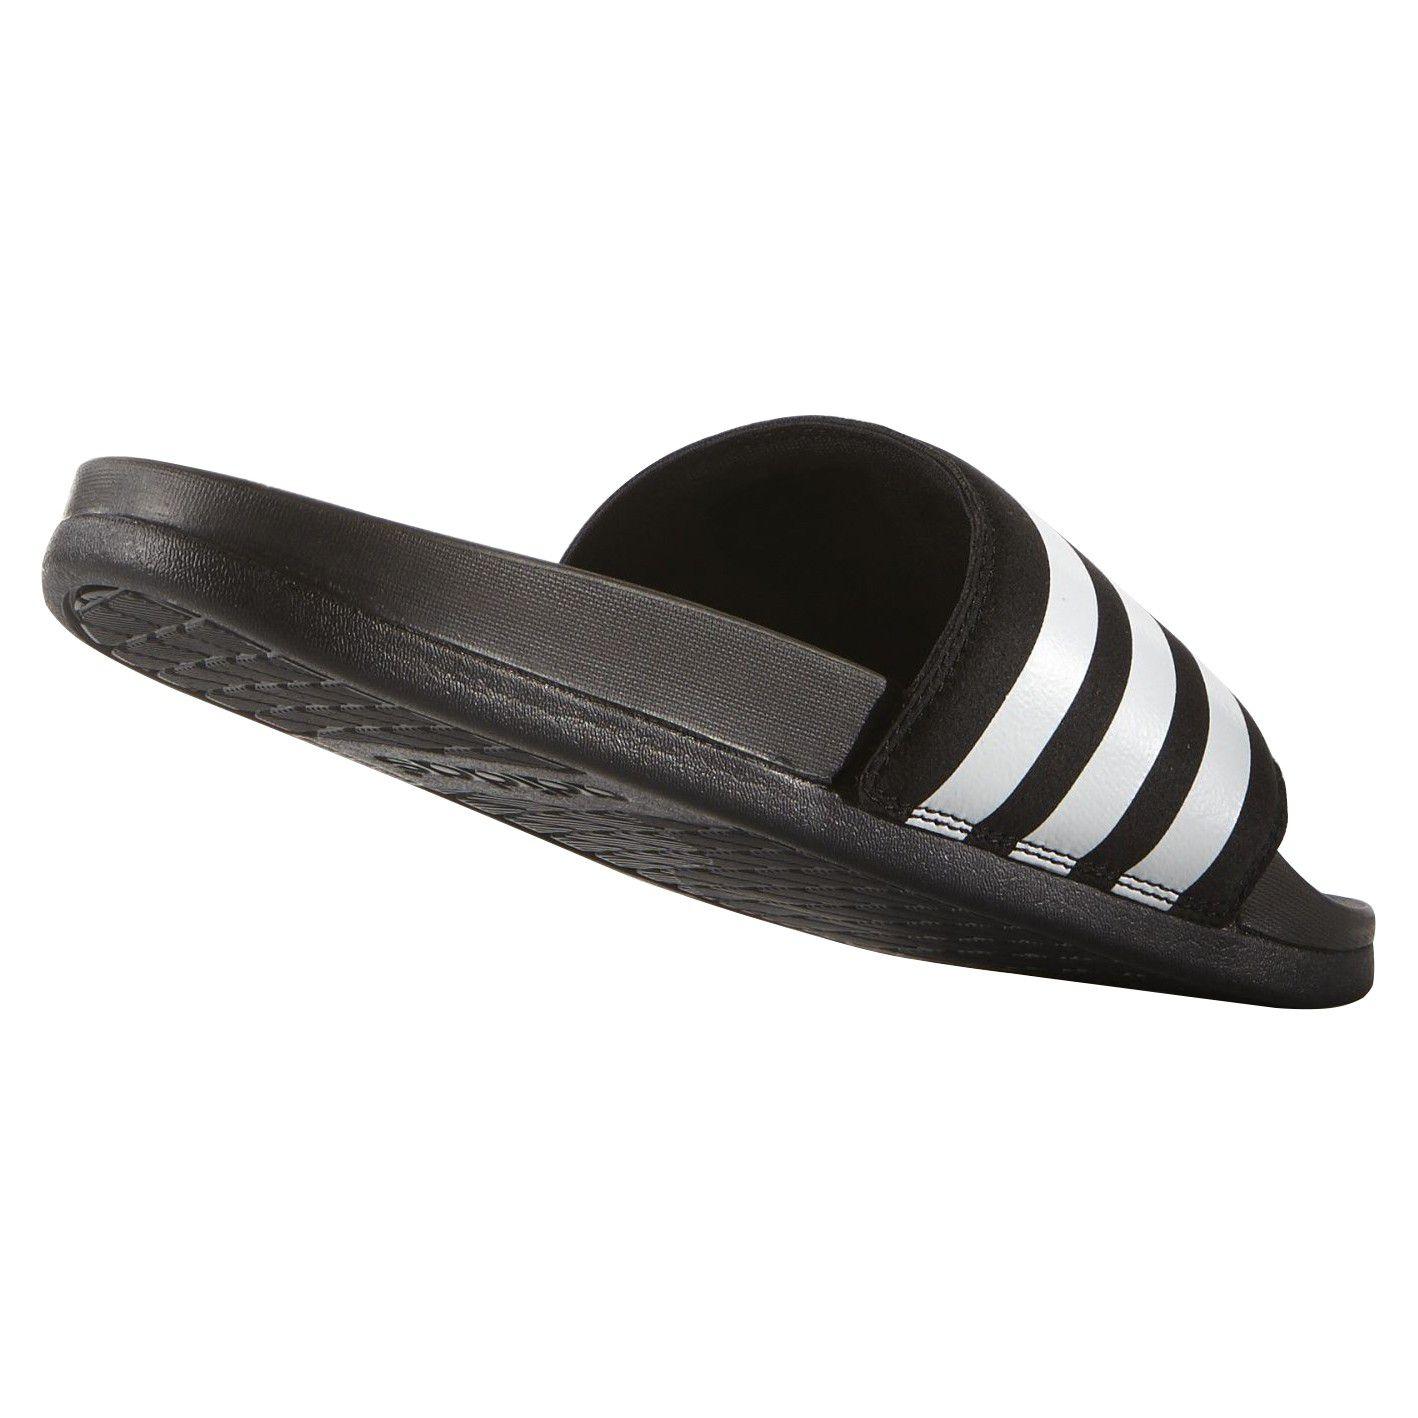 Chinelo Adidas Adilette Supercloud Plus Slides